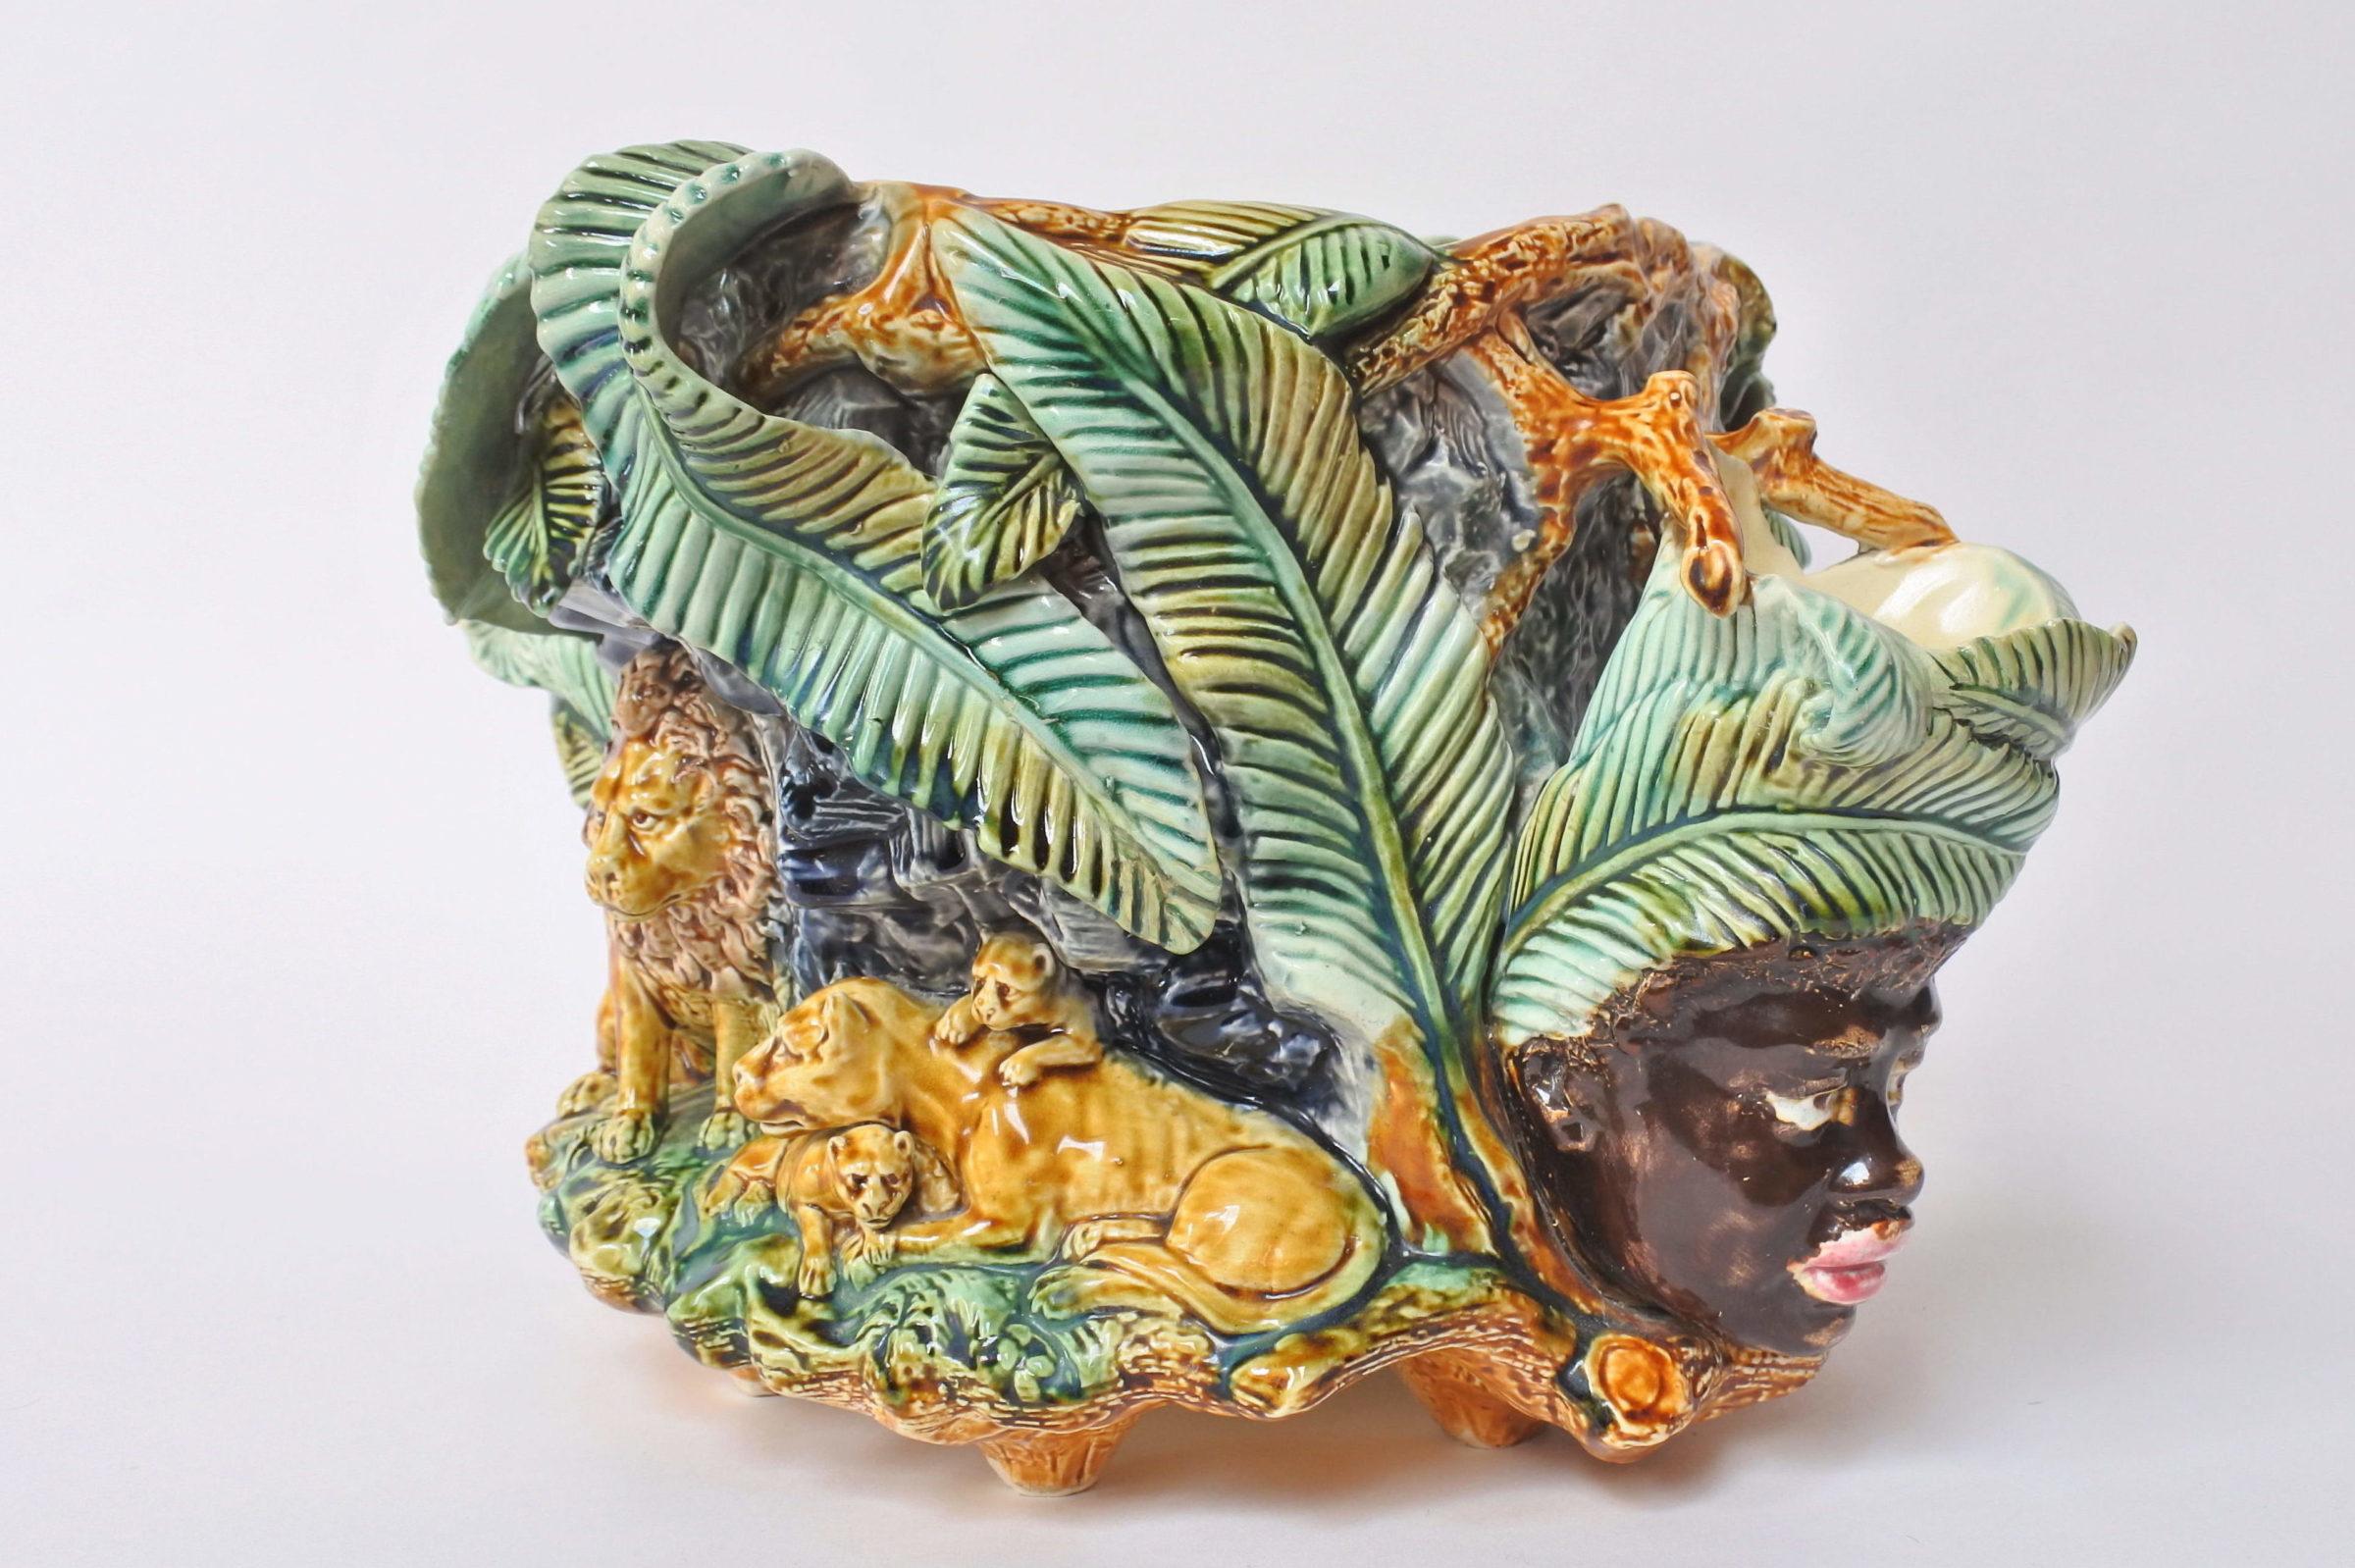 Centrotavola in ceramica barbotine con funzione di jardinière - Onnaing - 8